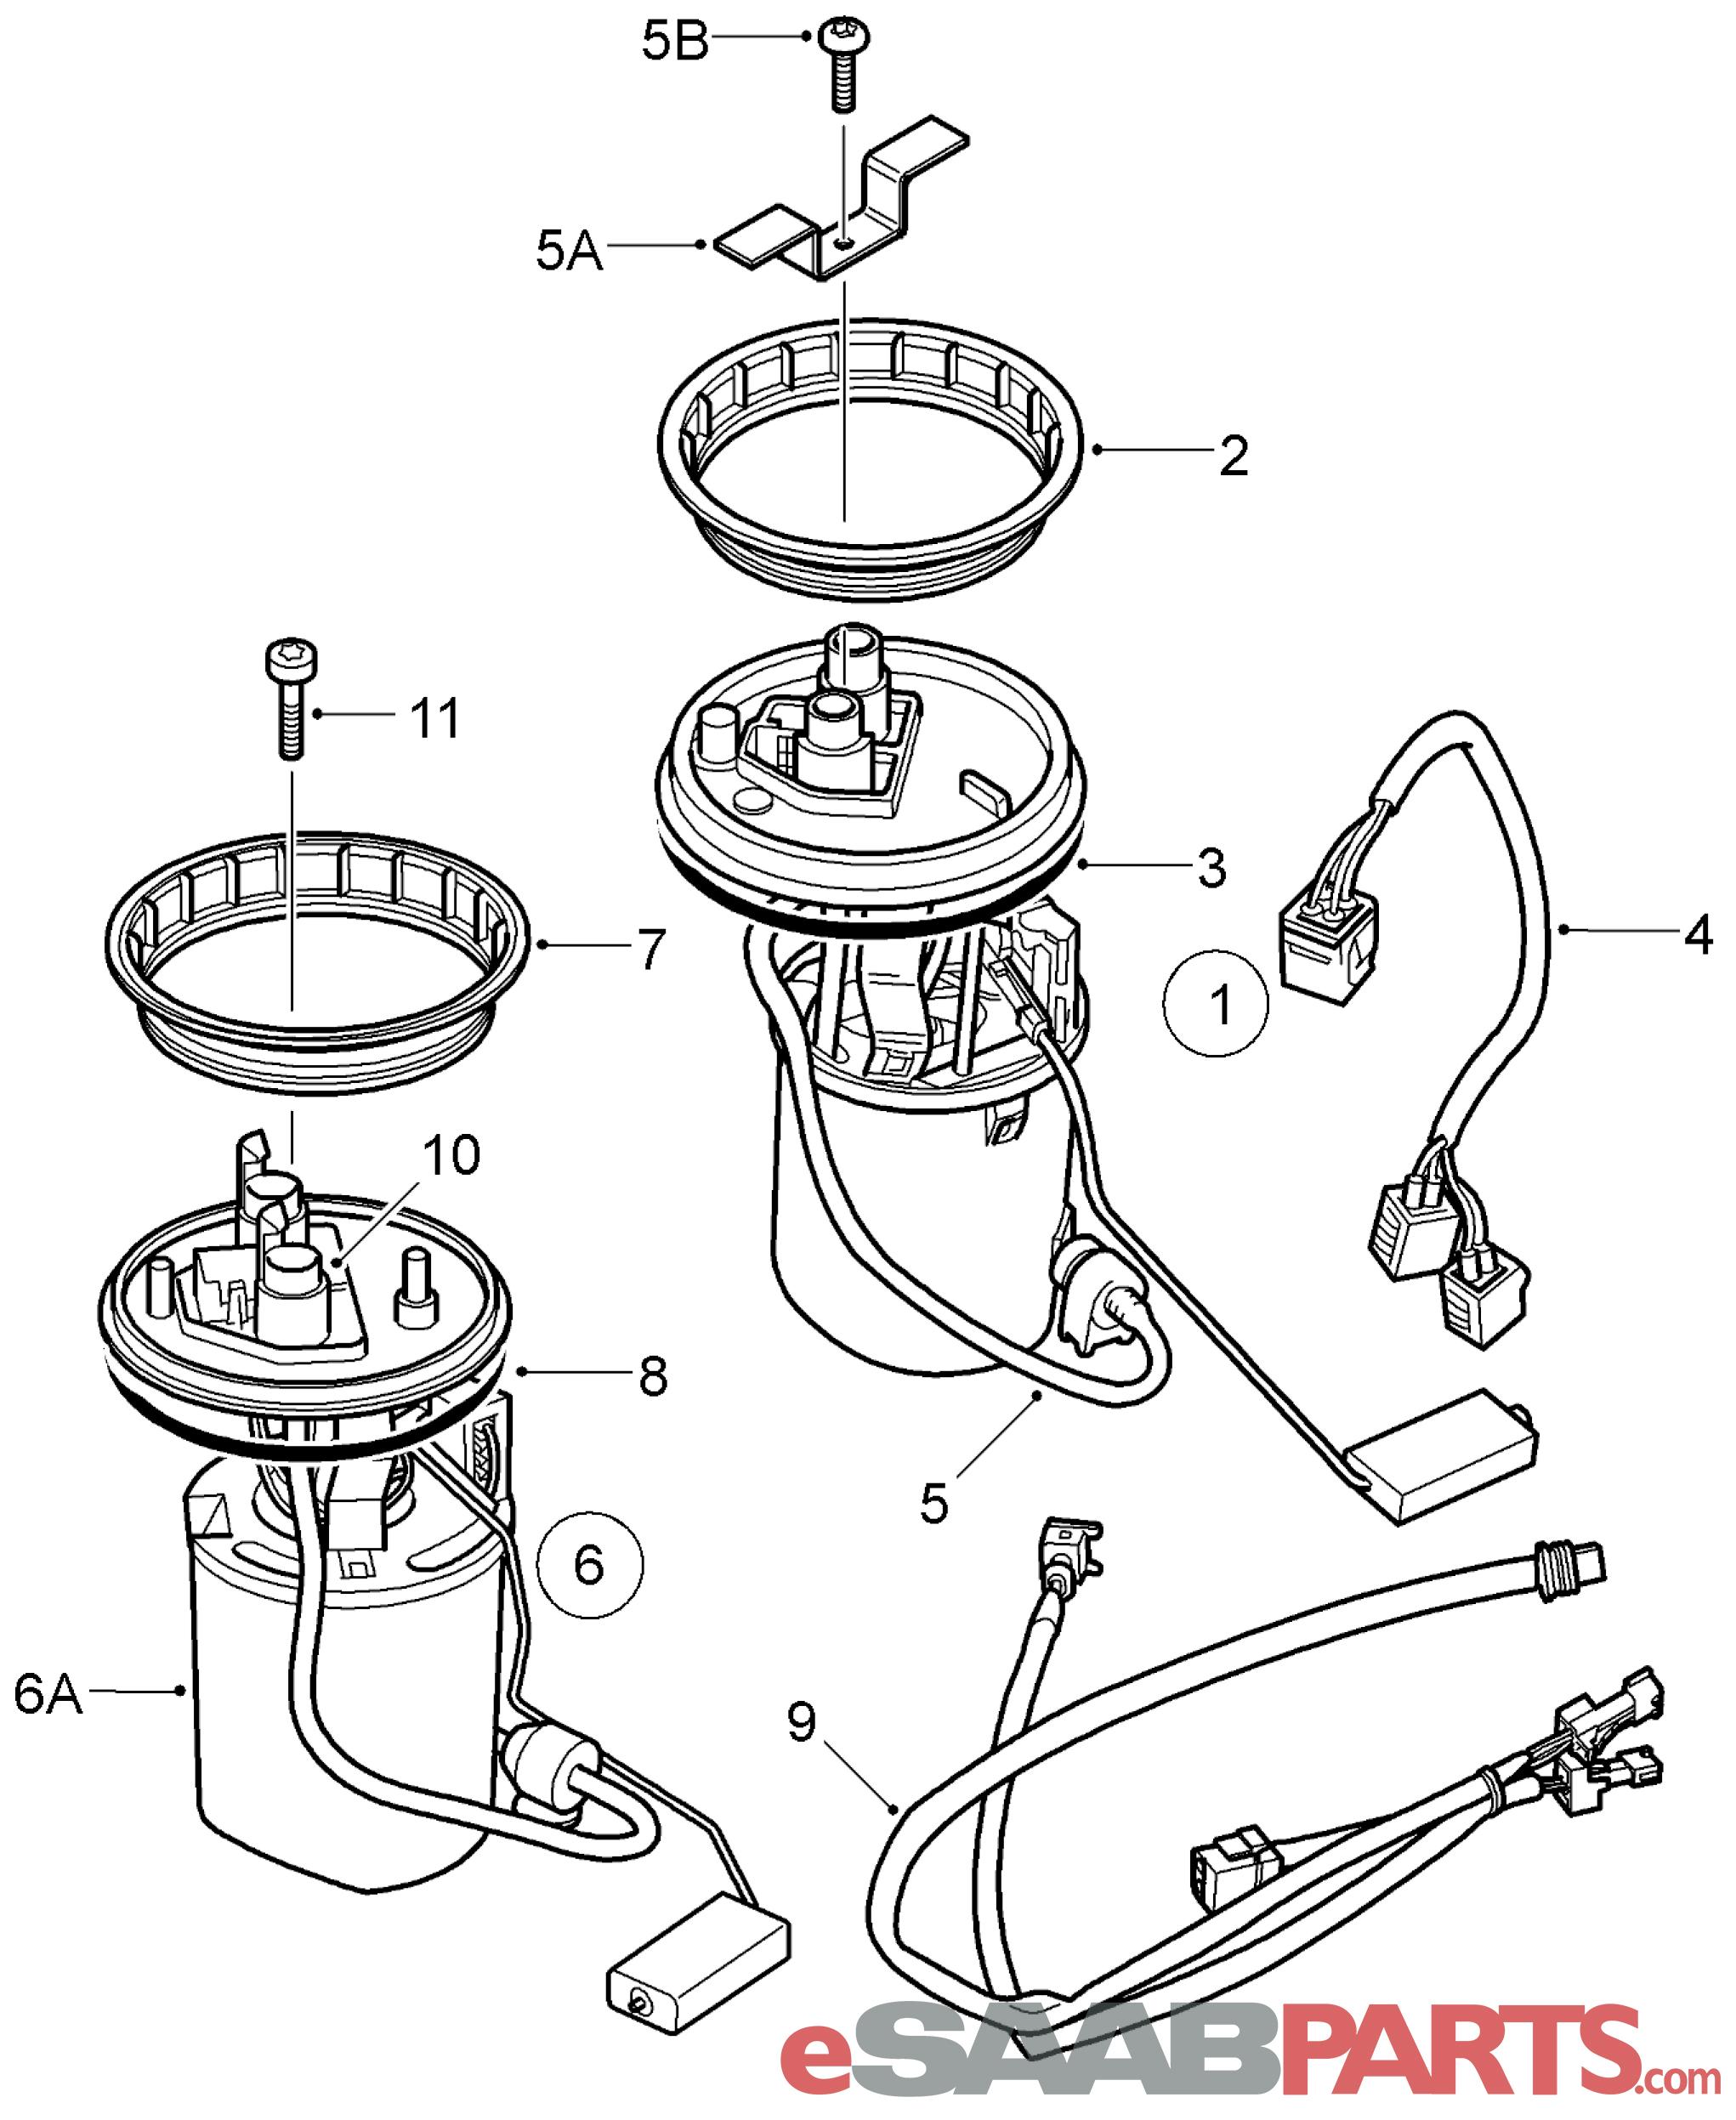 Saab 9 3 Fuel Pump